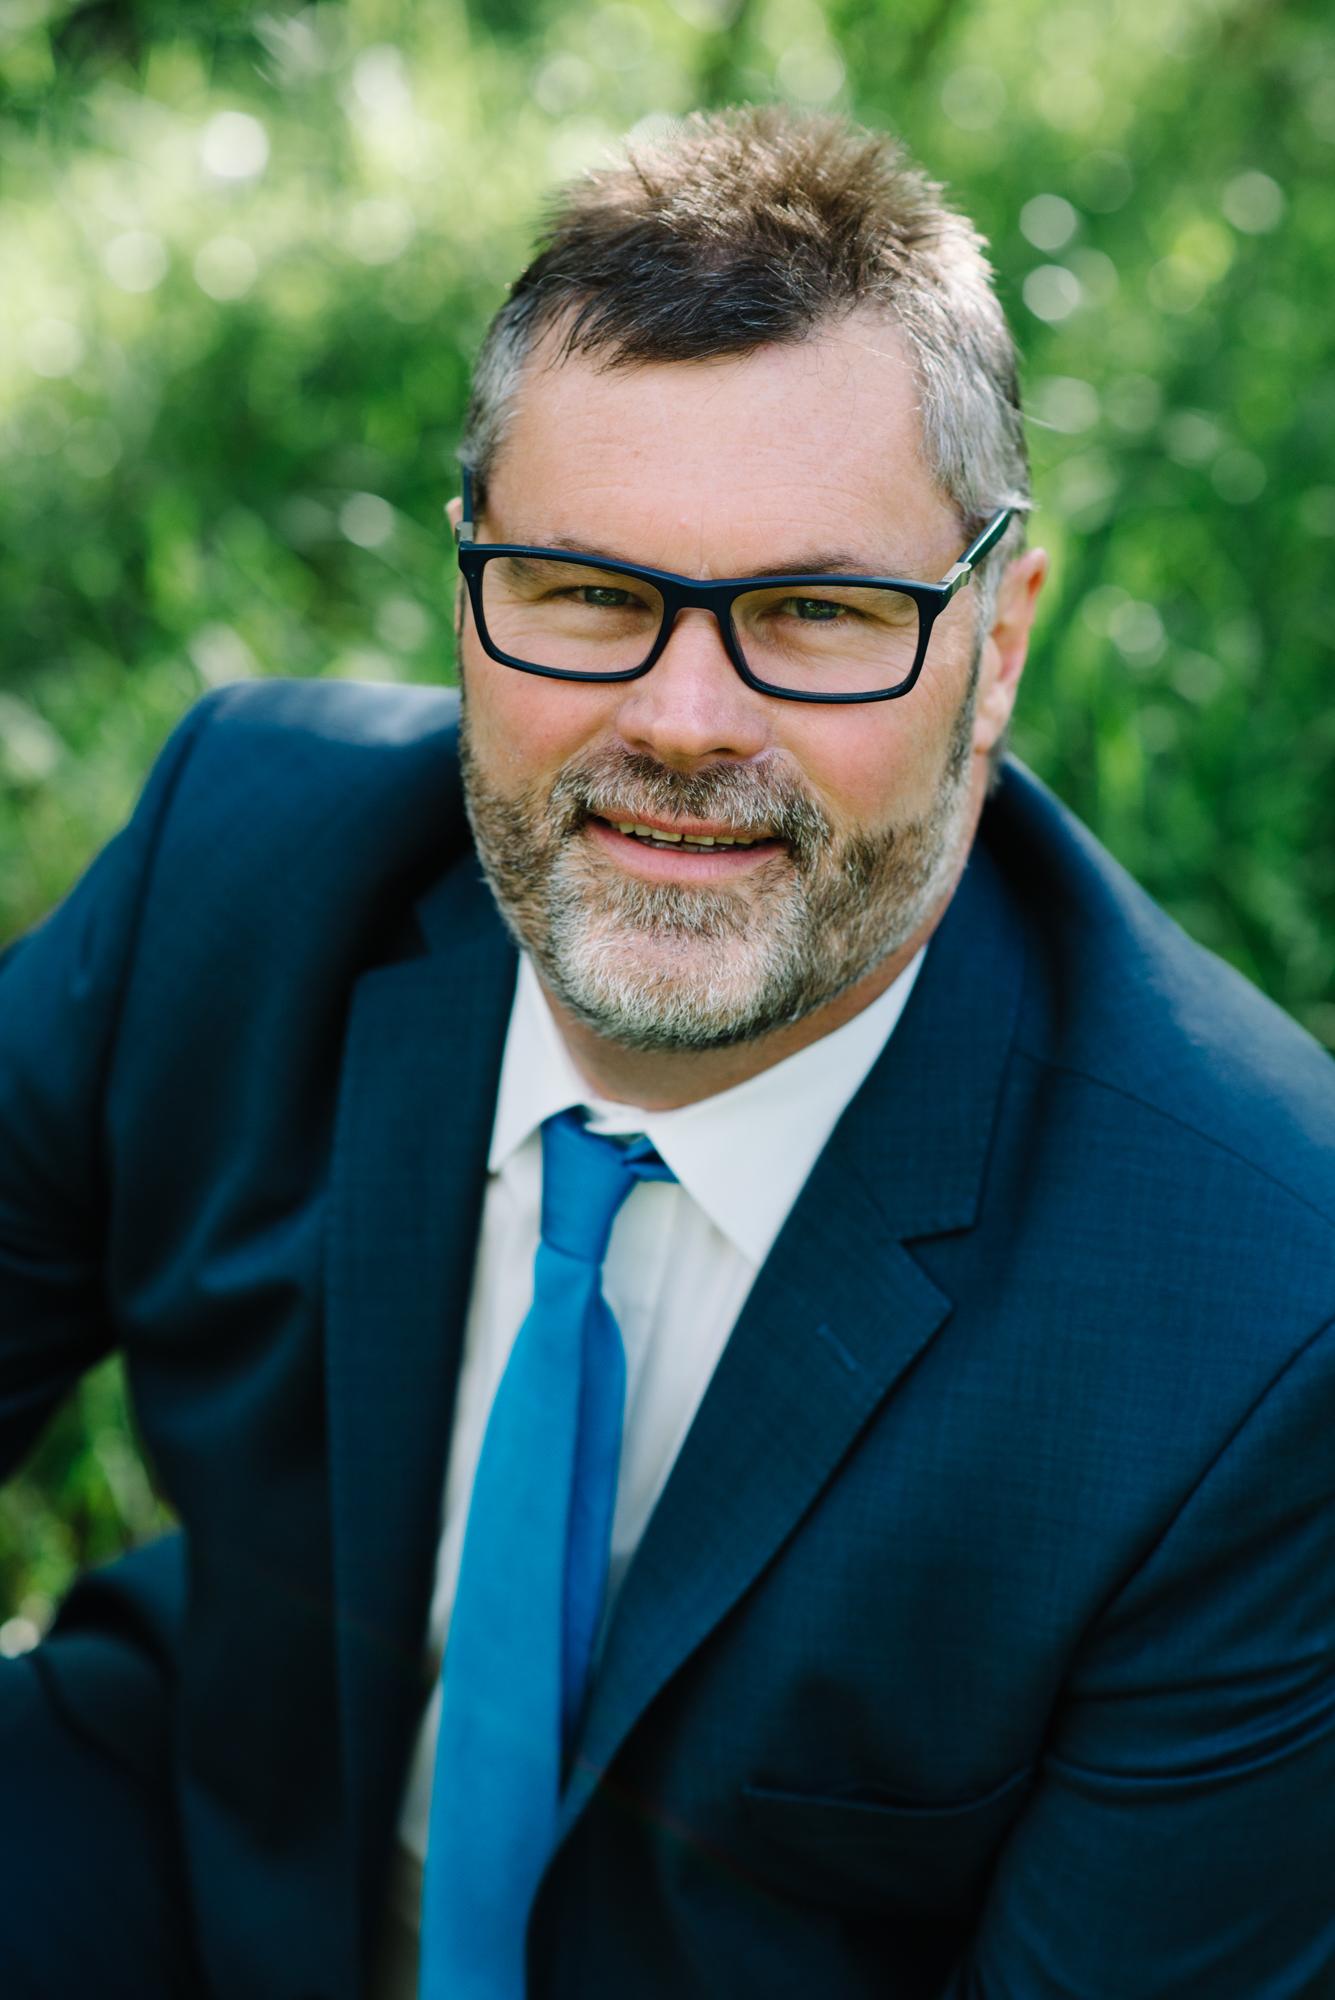 Russell Dunn | Agents Representative